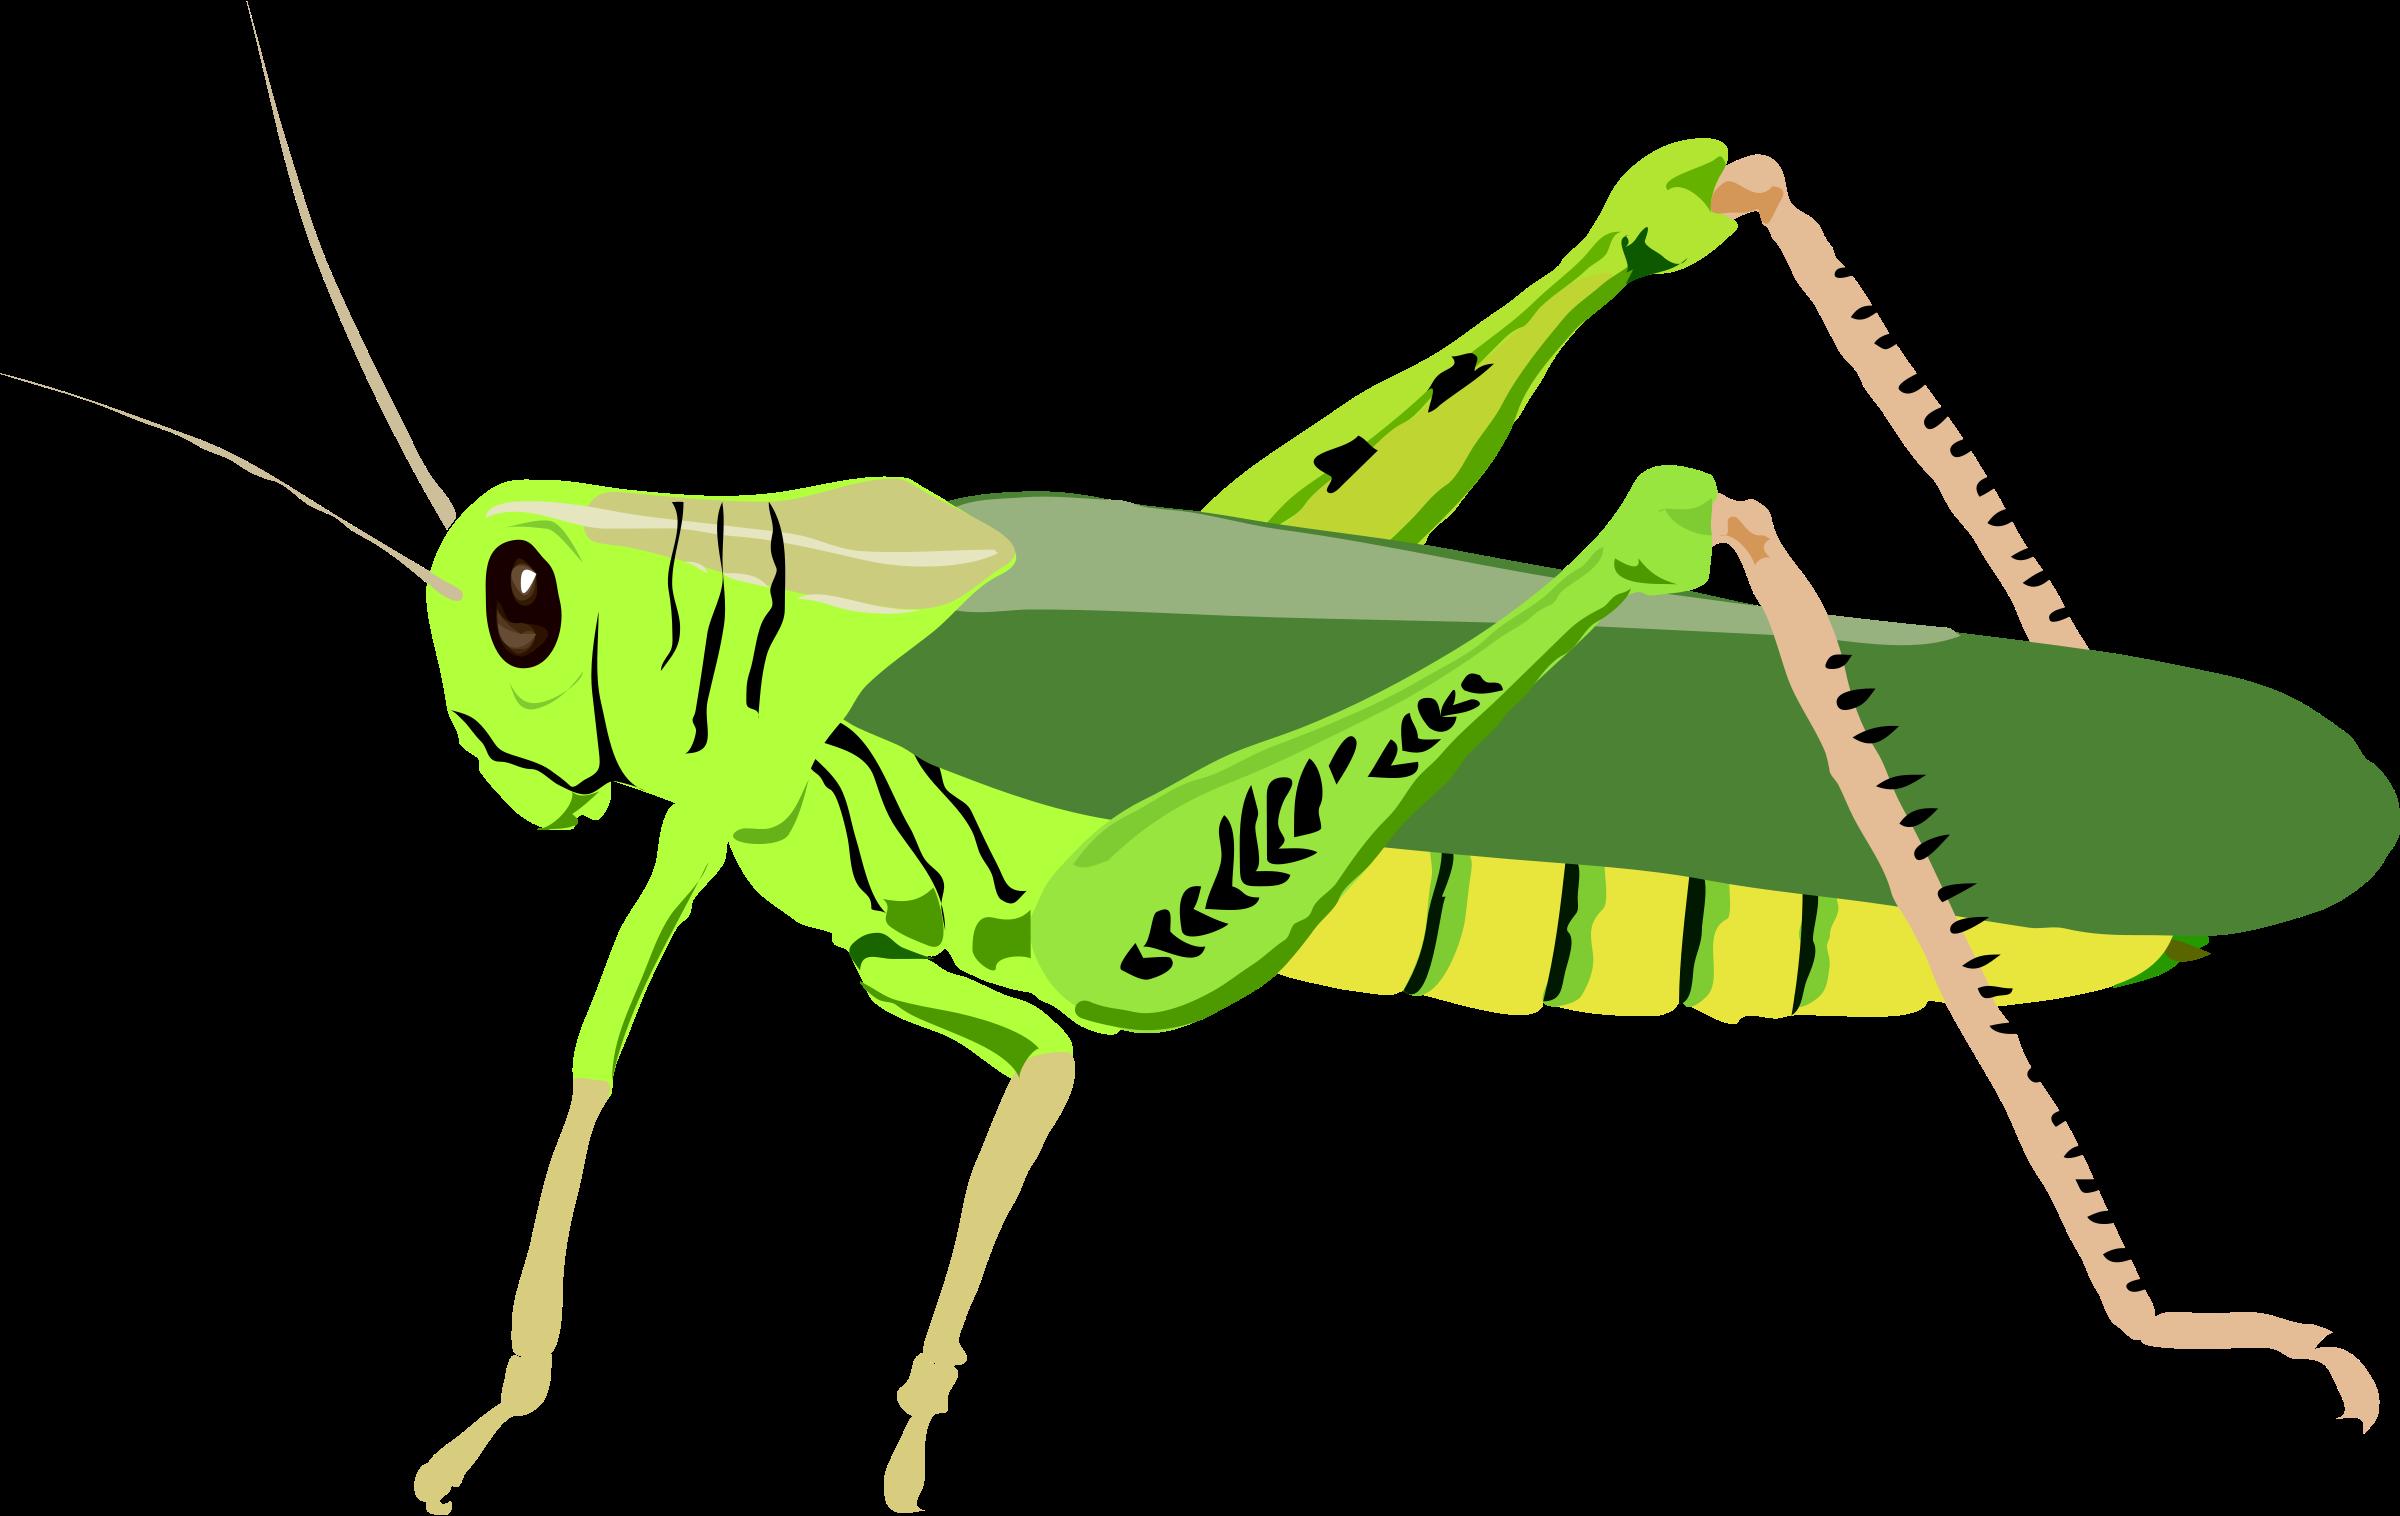 Grasshopper clipart images free